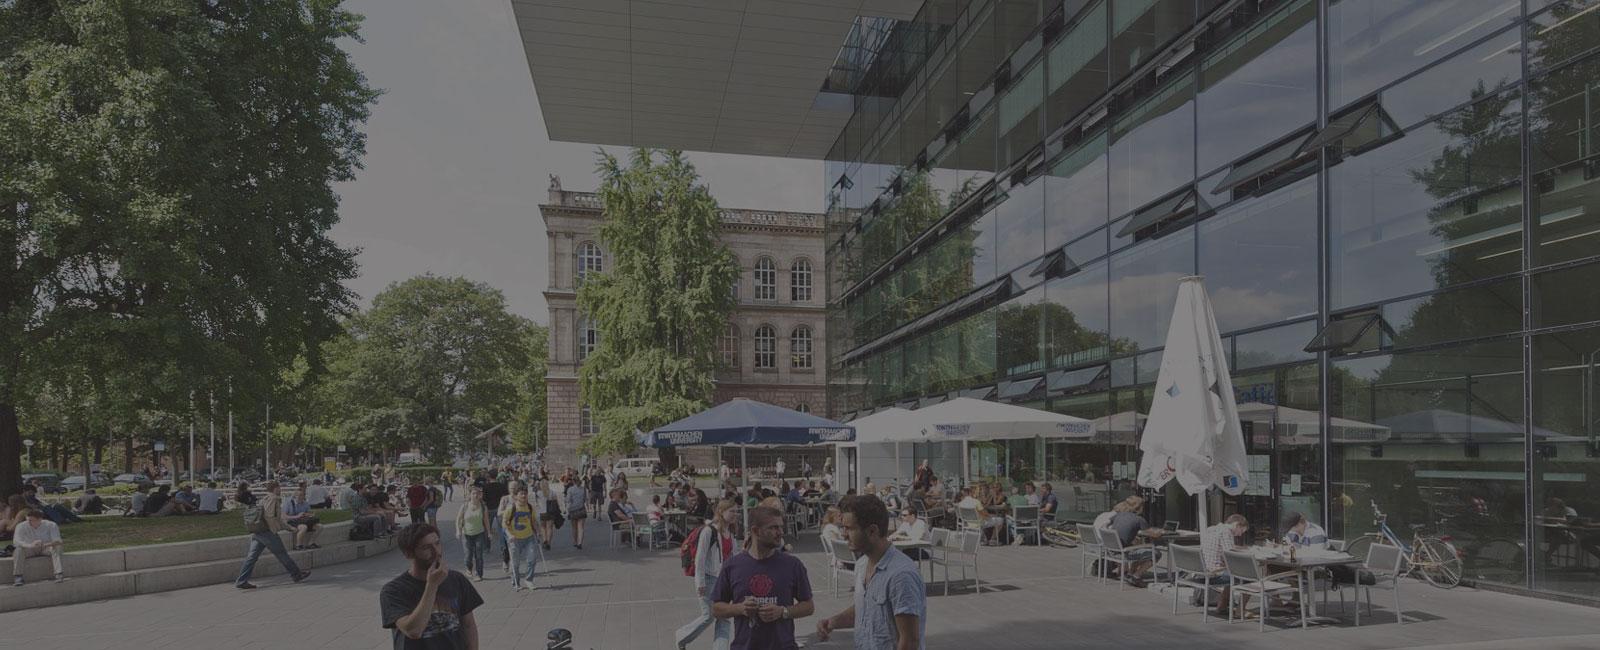 TU9-Universities